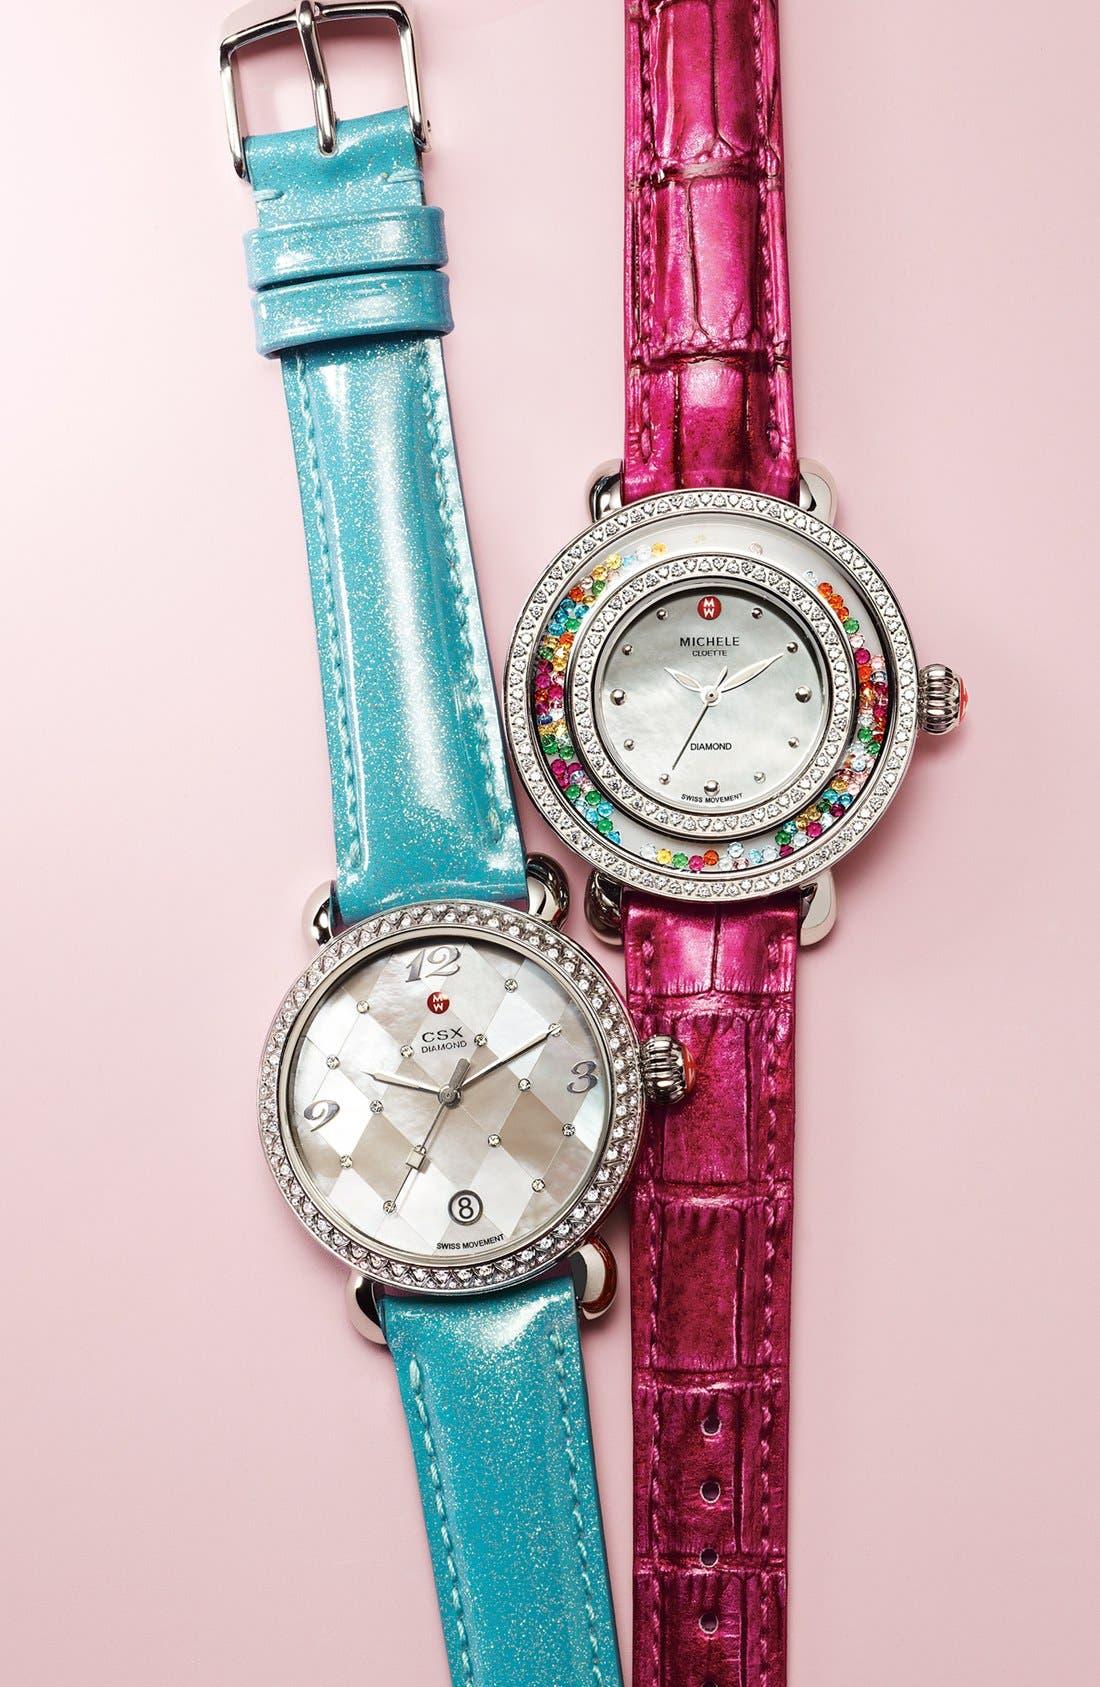 Main Image - MICHELE 'Cloette Carnival' Customizable Watch